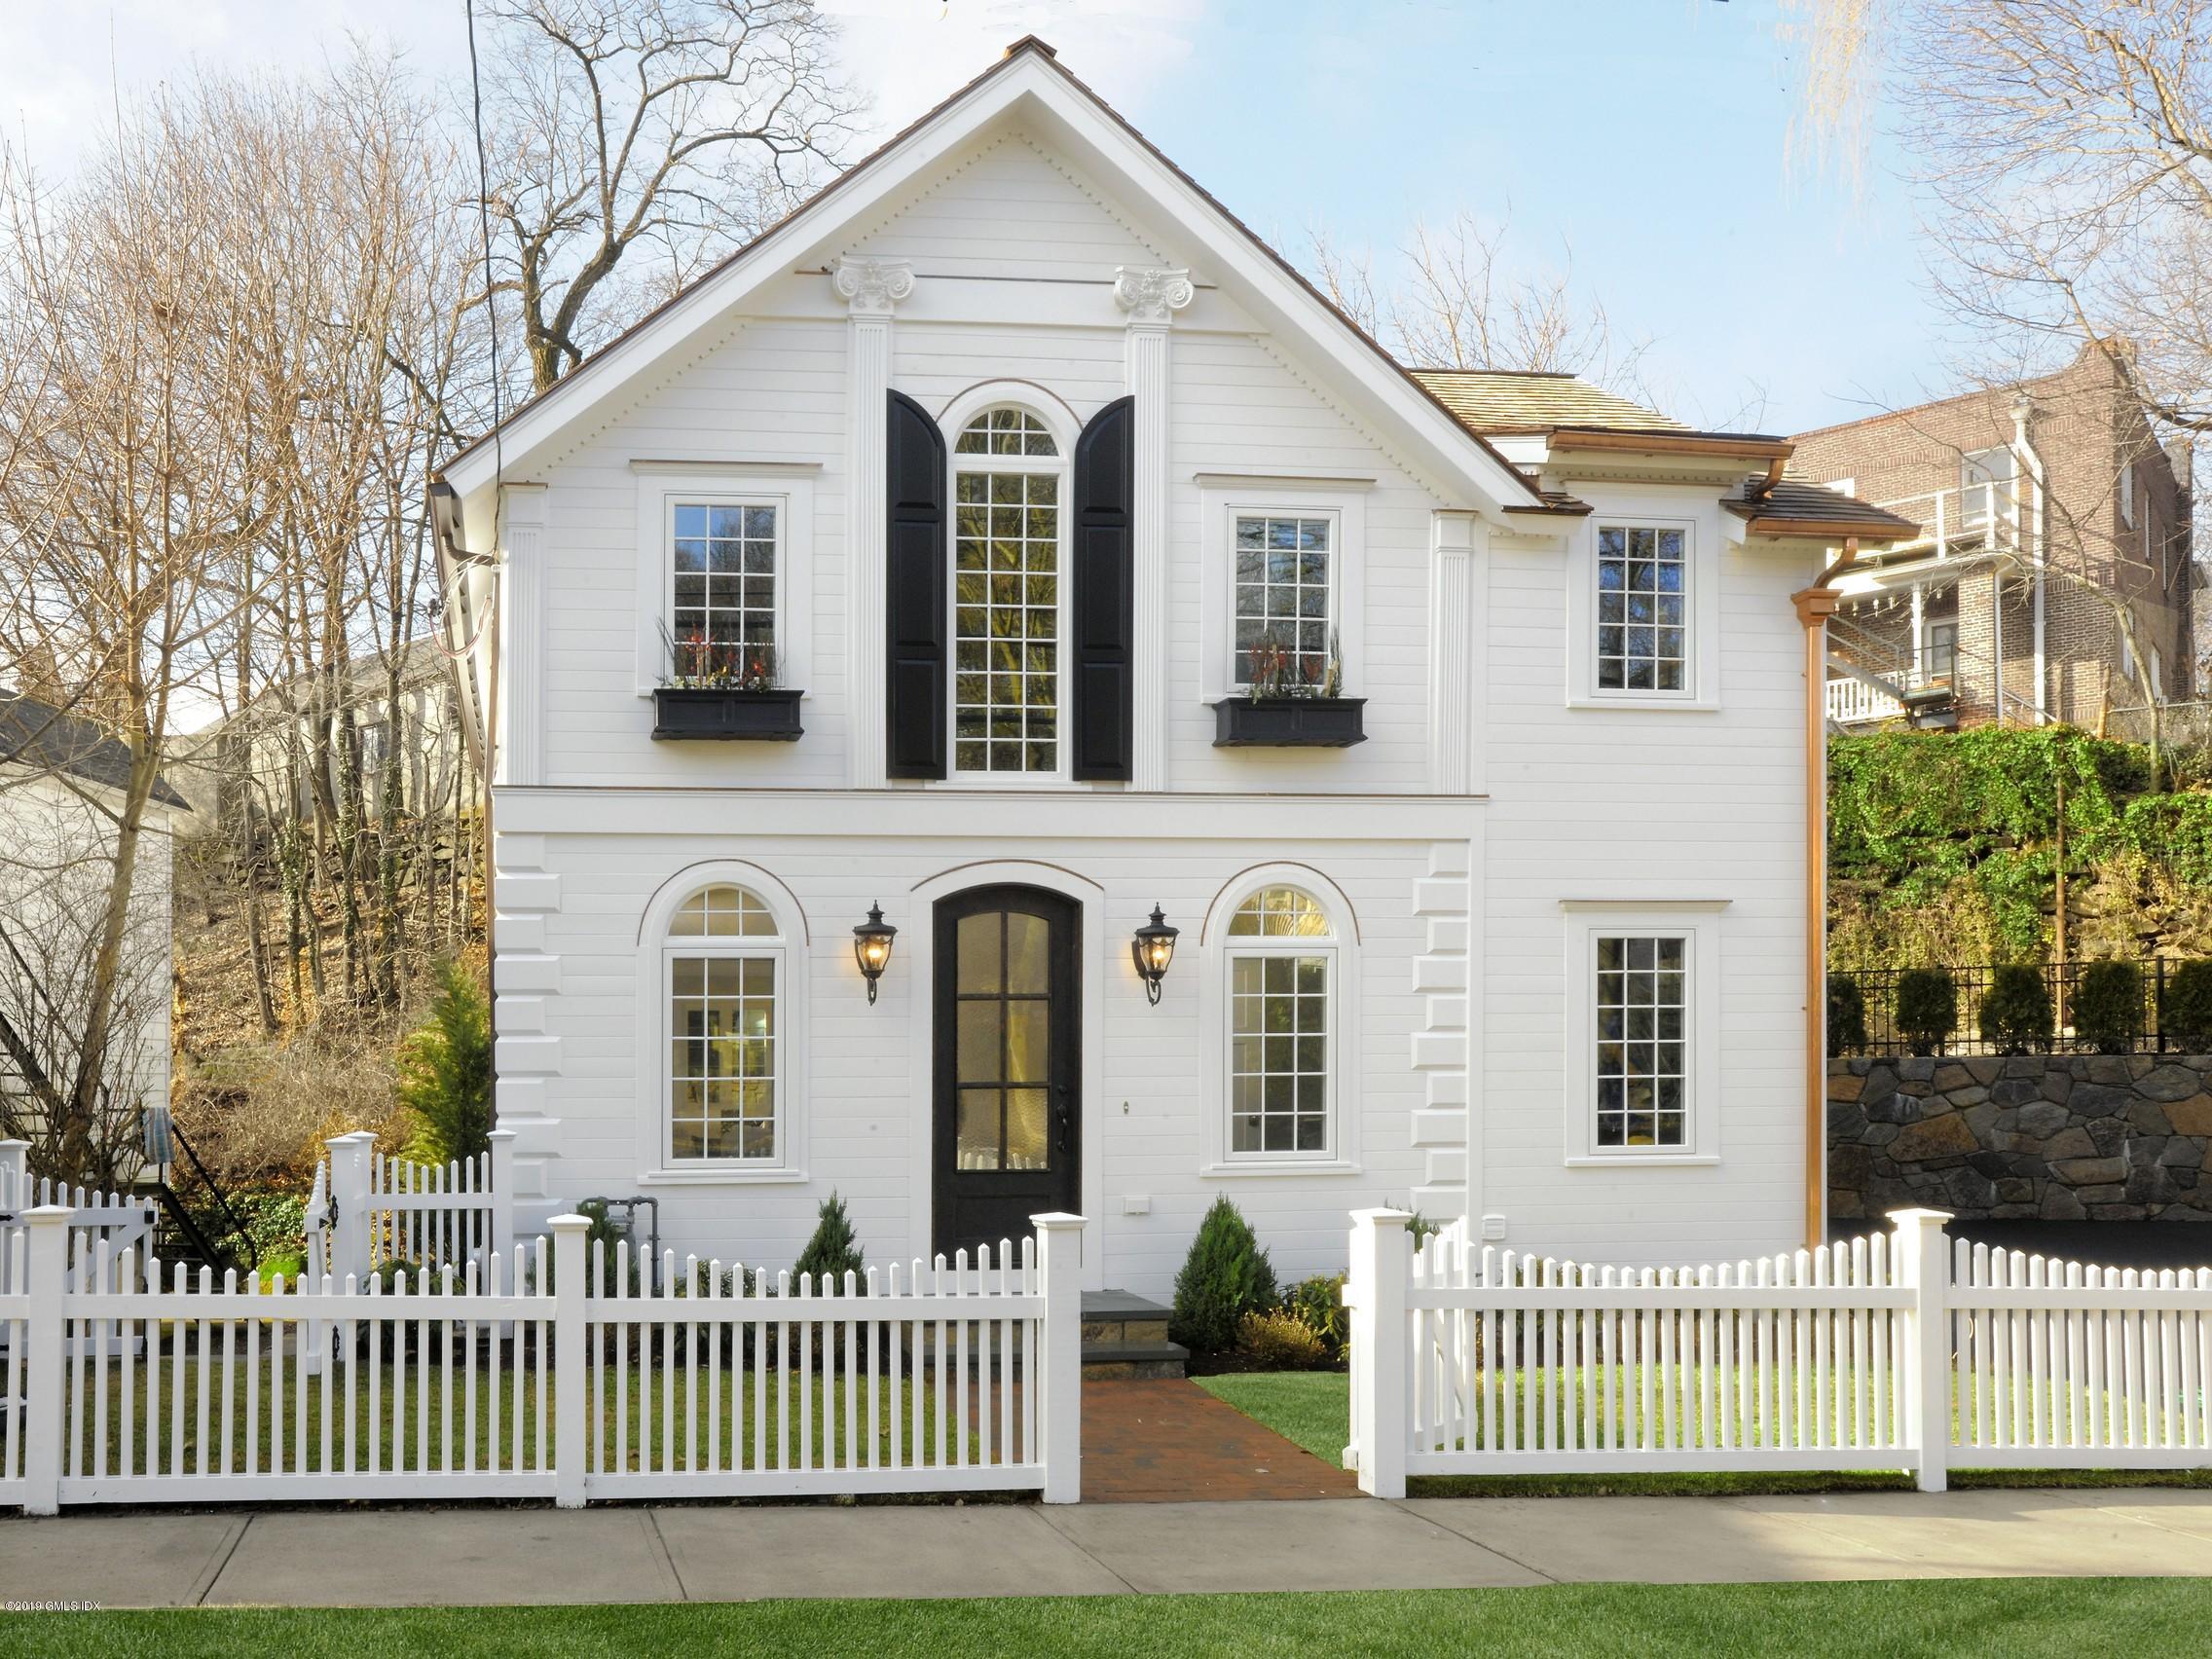 200 Davis Avenue, Greenwich, Connecticut 06830, 3 Bedrooms Bedrooms, ,2 BathroomsBathrooms,Single family,For sale,Davis,109898